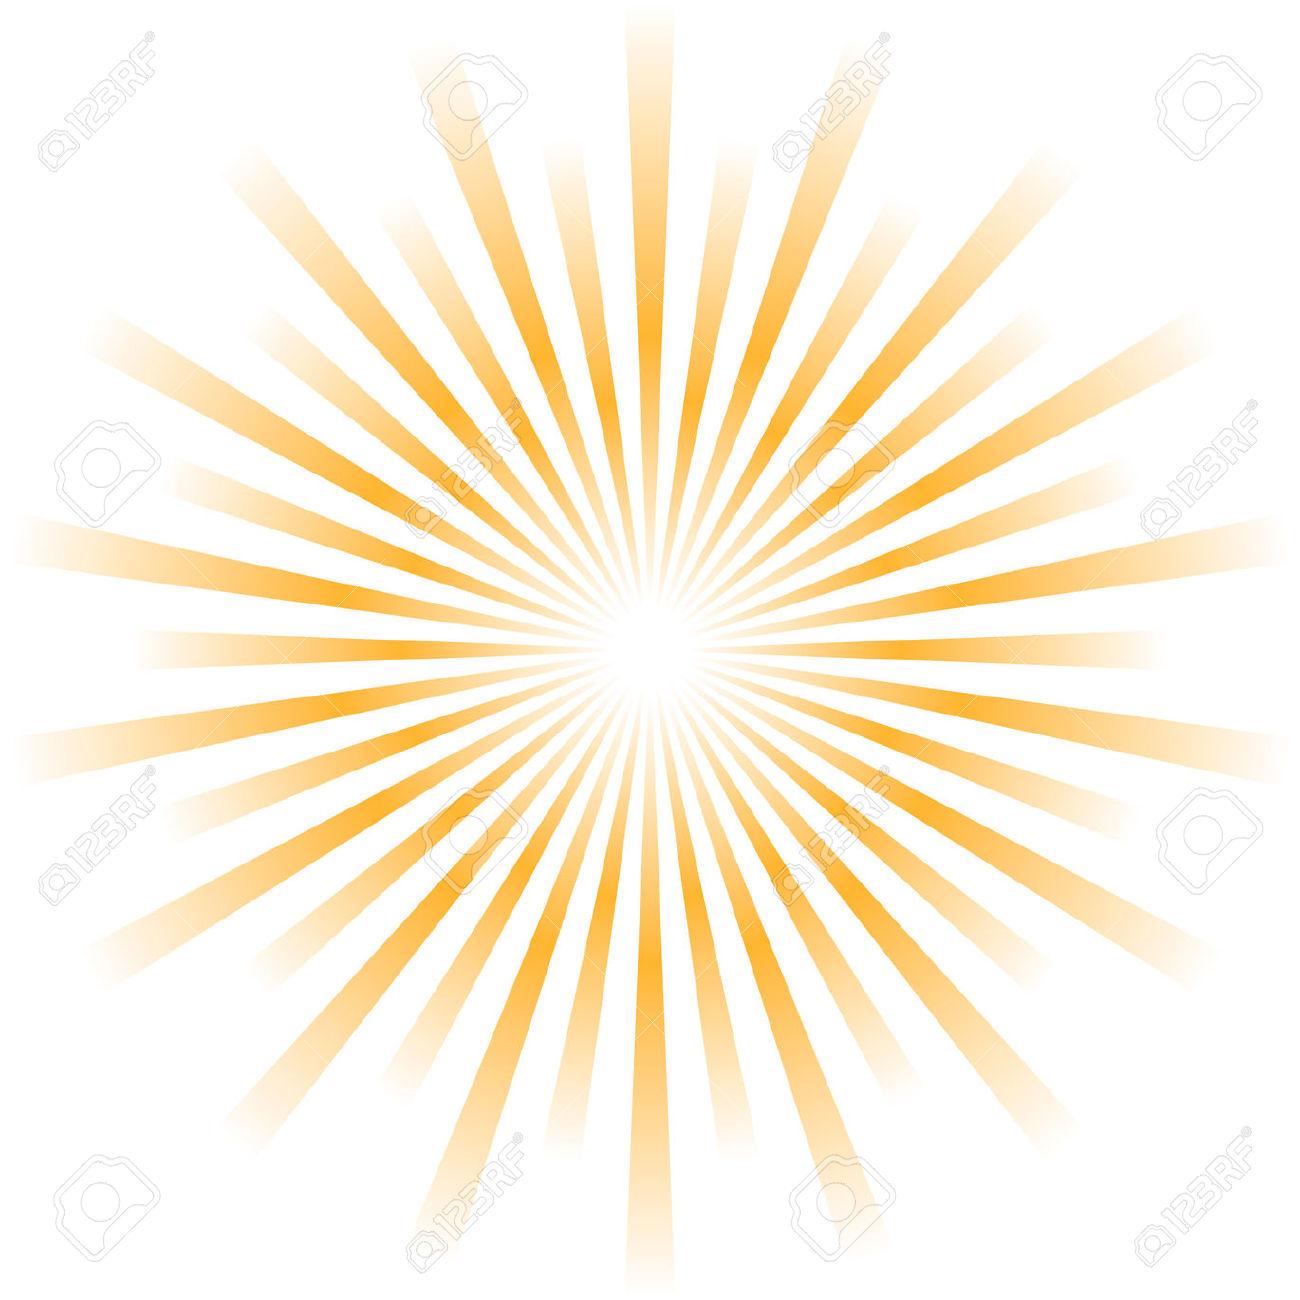 Sunburst clip art.